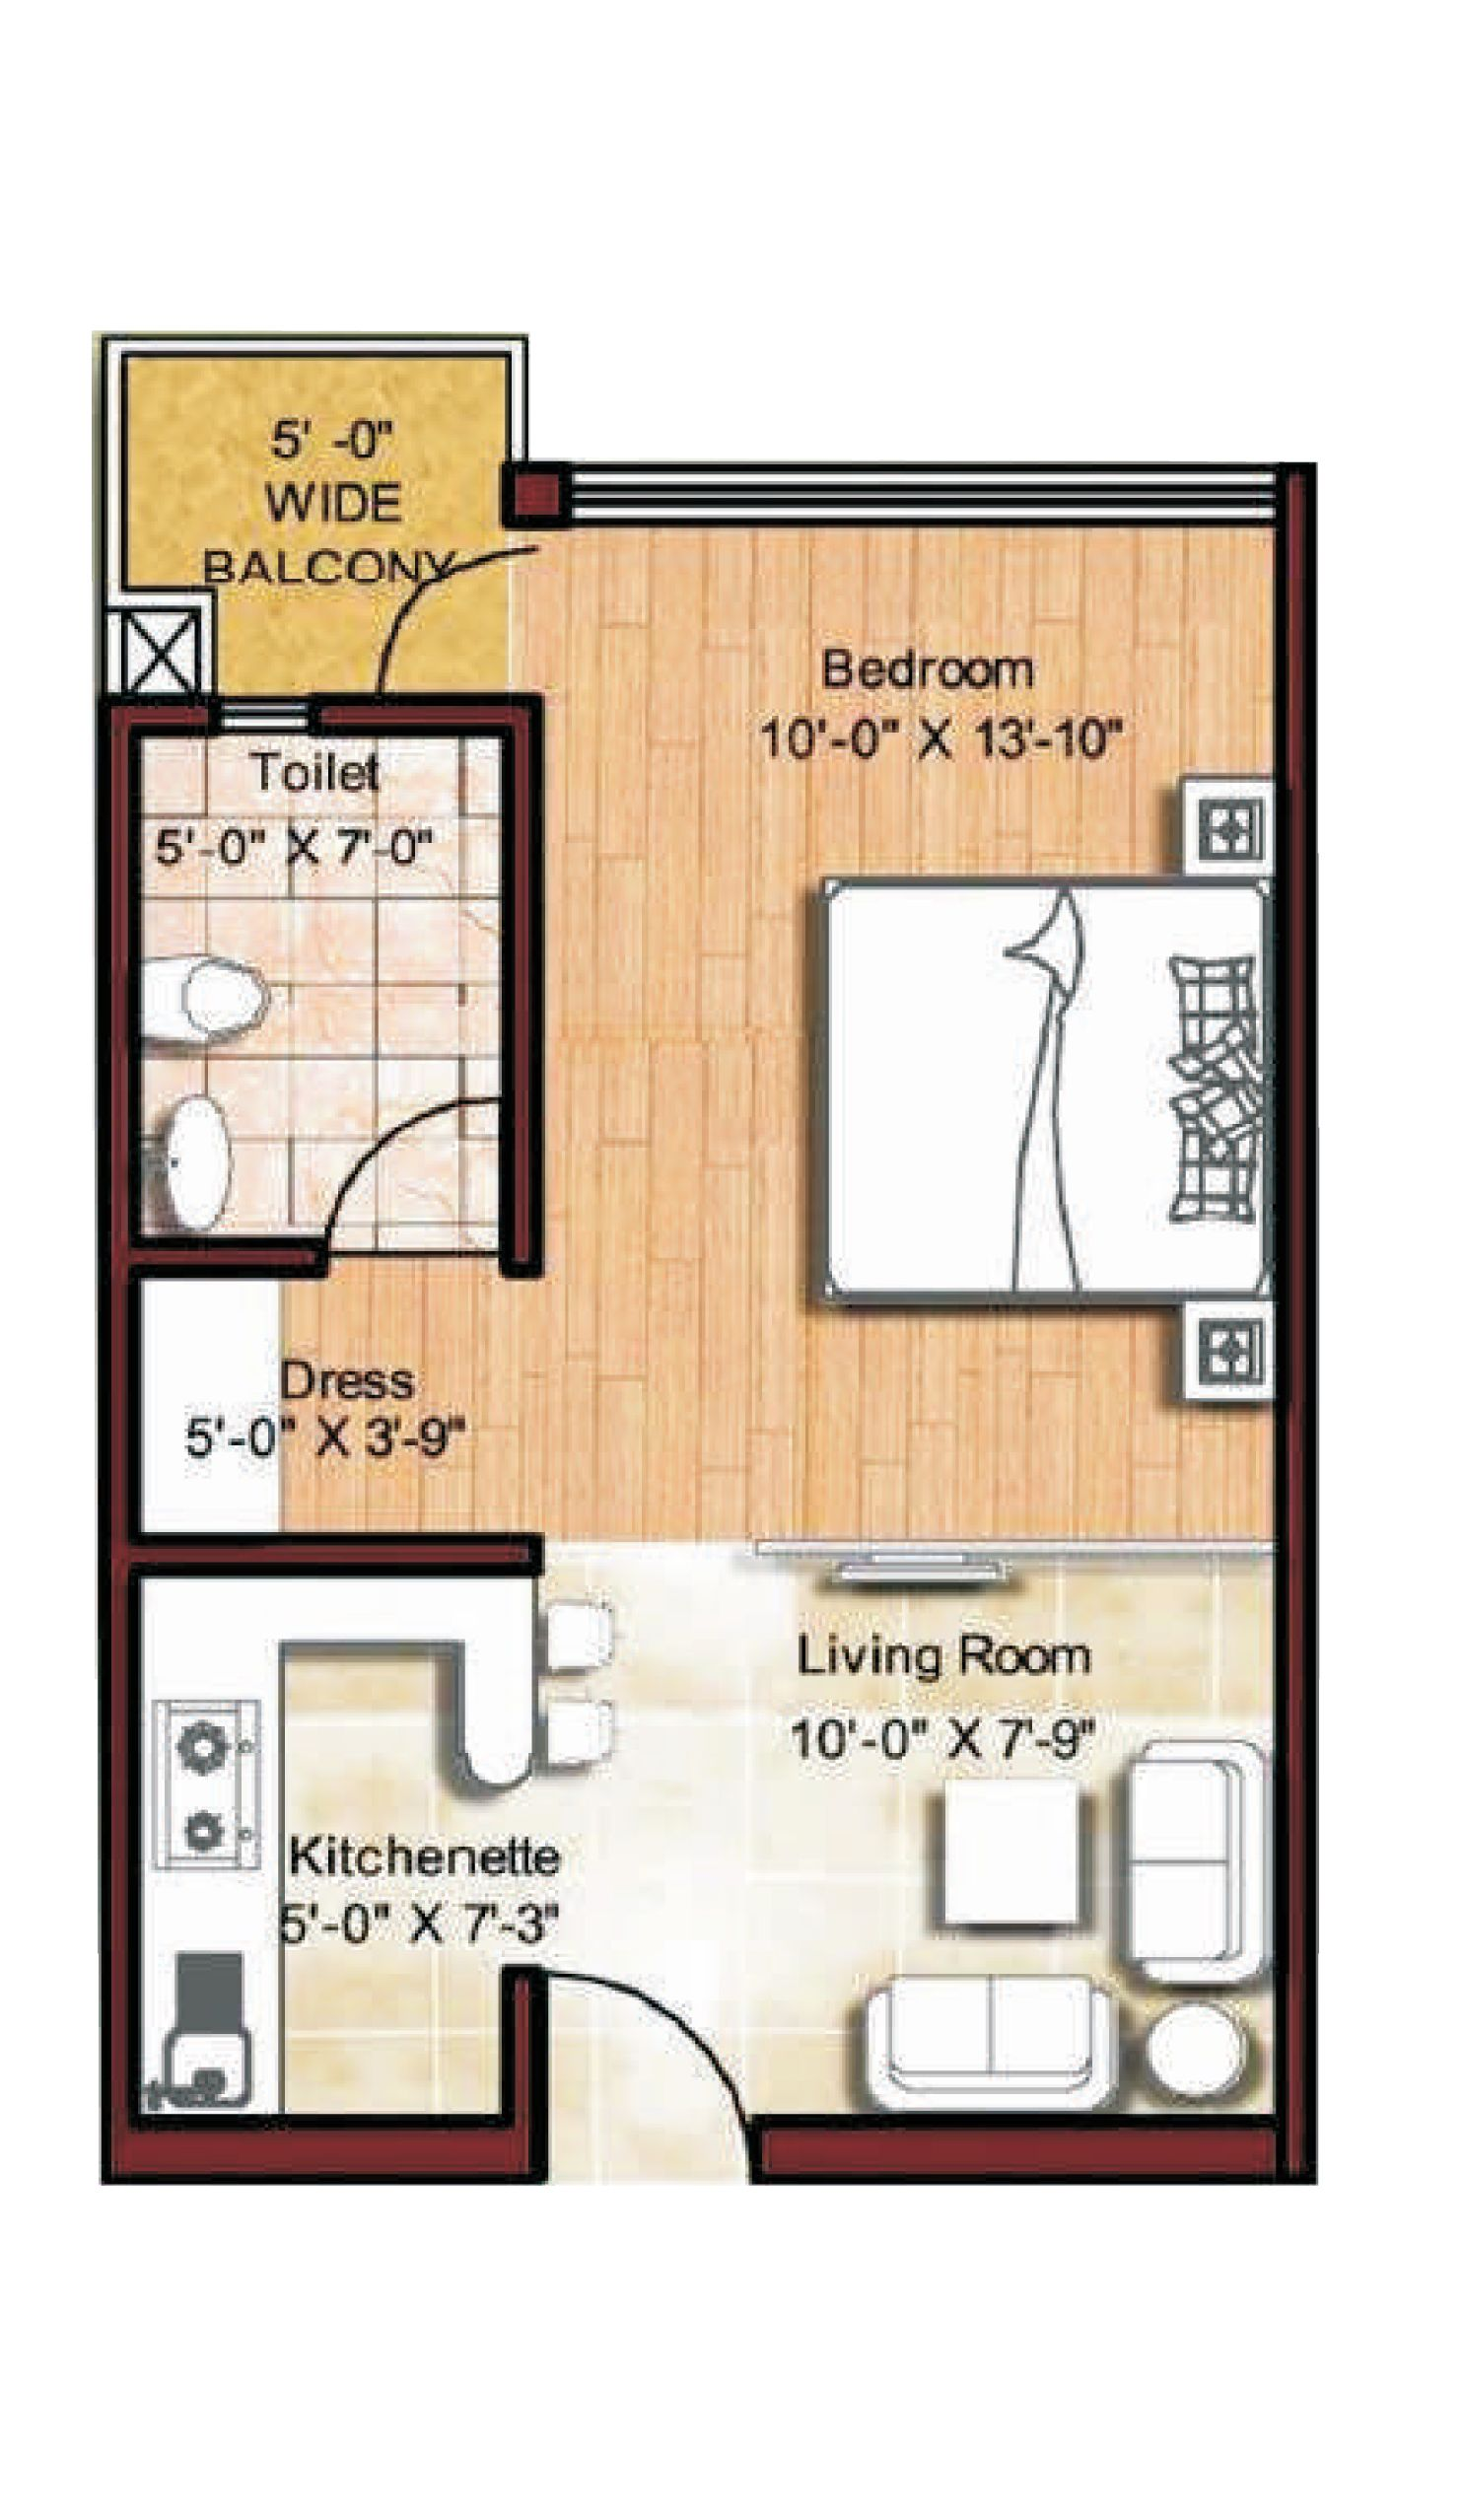 micro apartments floor plans | Floor Plan | Tiny Spaces ...